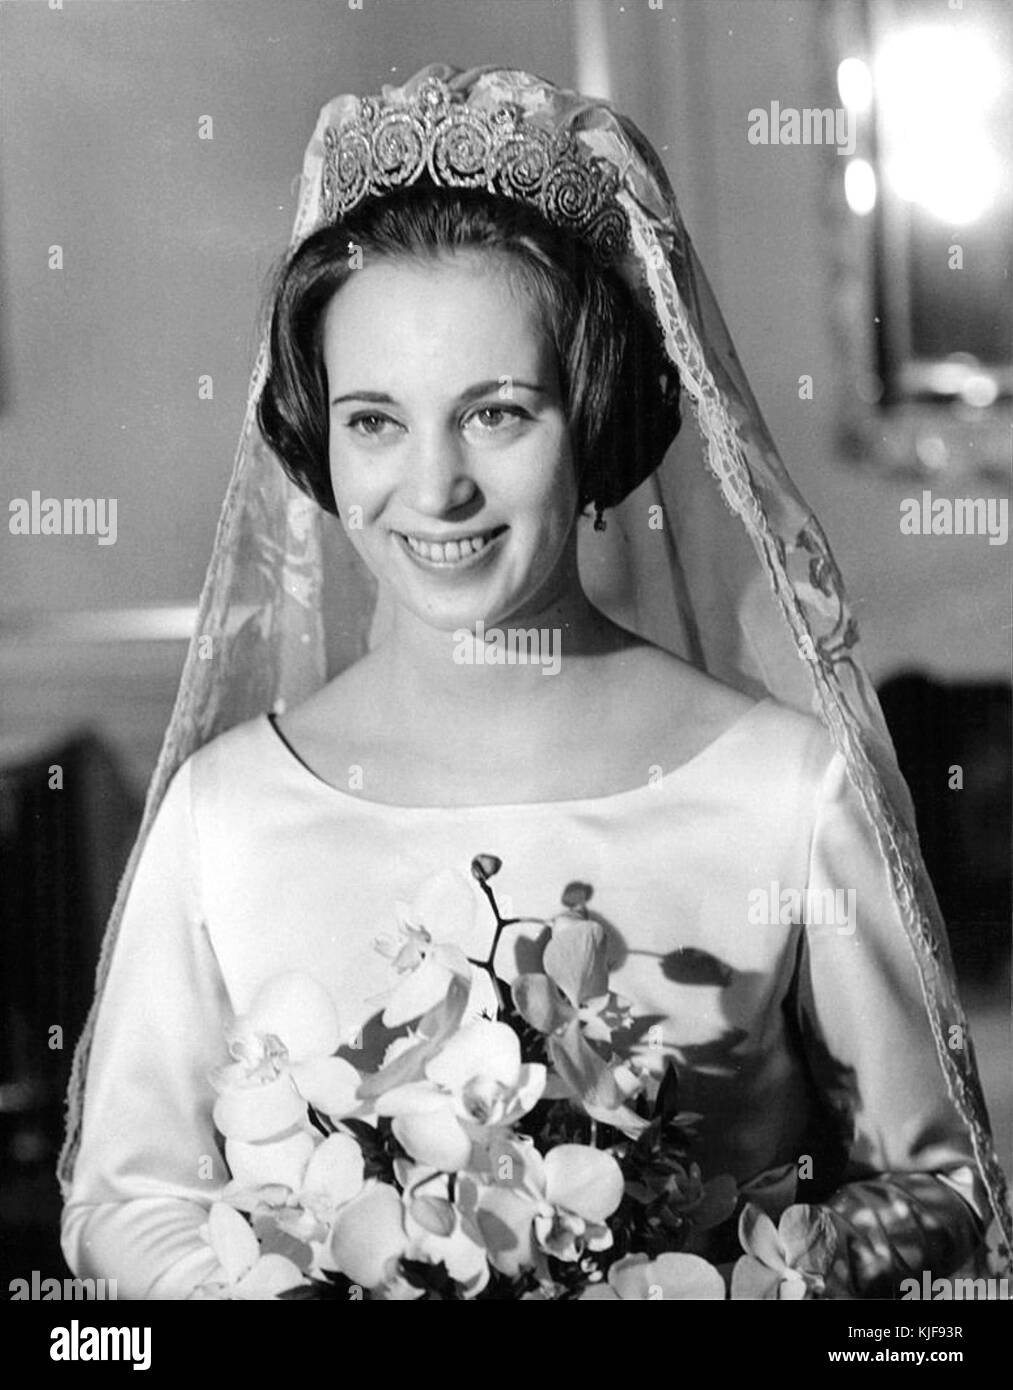 A wedding photo of Princess Benedikte of Denmark February 4 1968 142364707195 - Stock Image